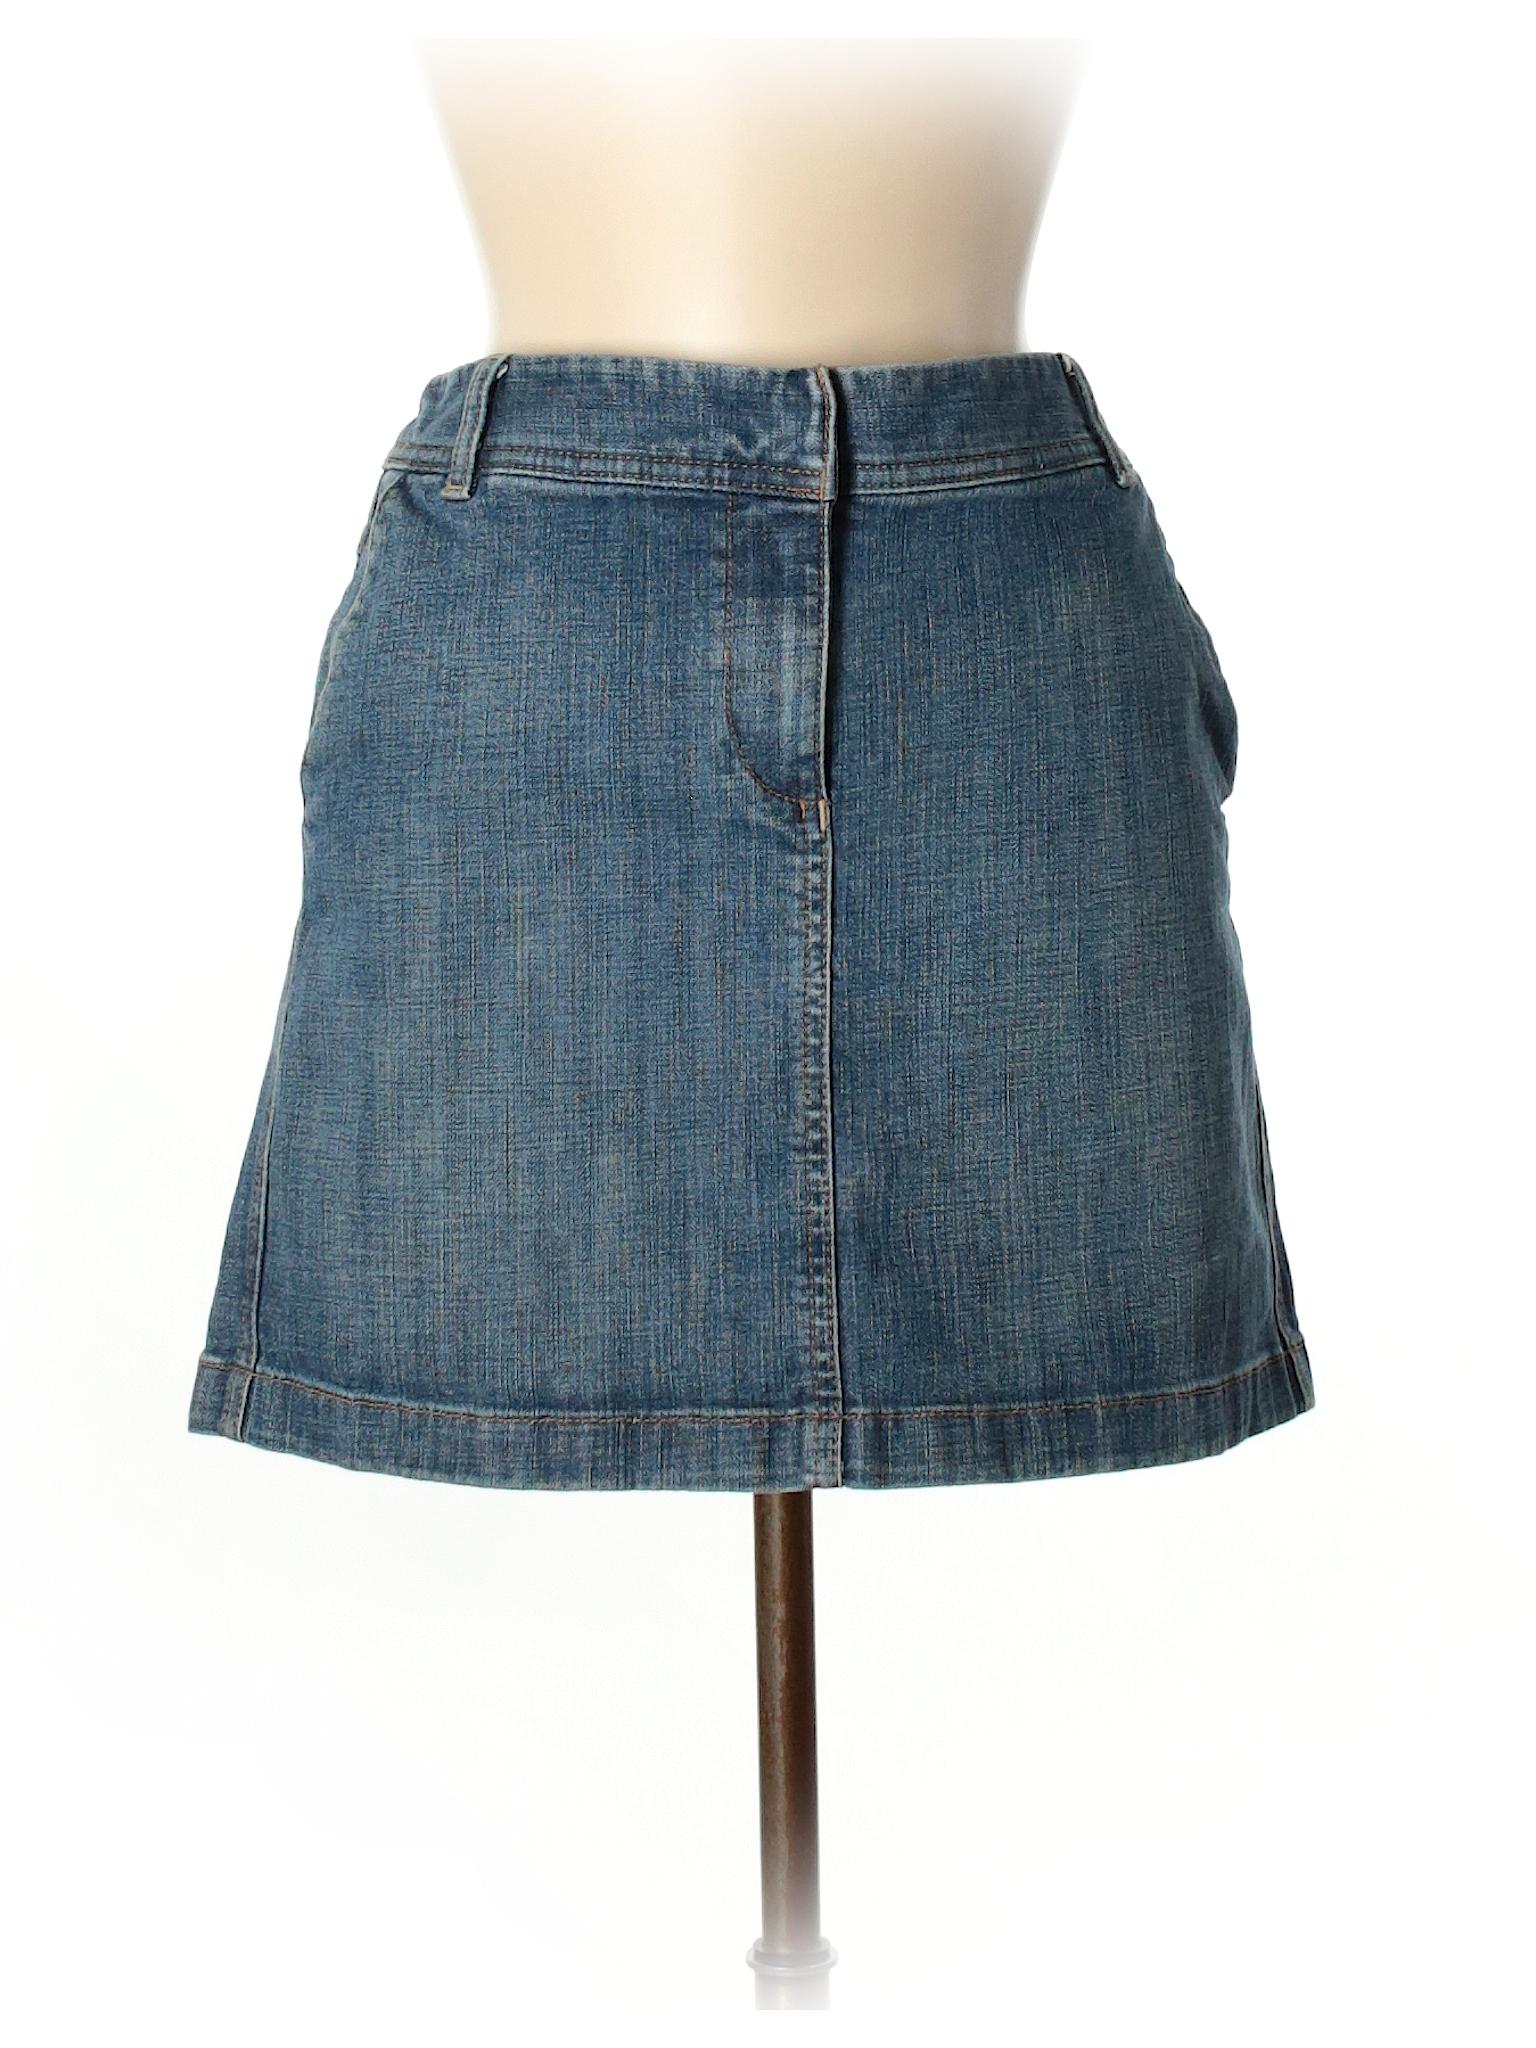 b70985f078 Ann Taylor LOFT Solid Blue Denim Skirt Size 6 - 81% off | thredUP